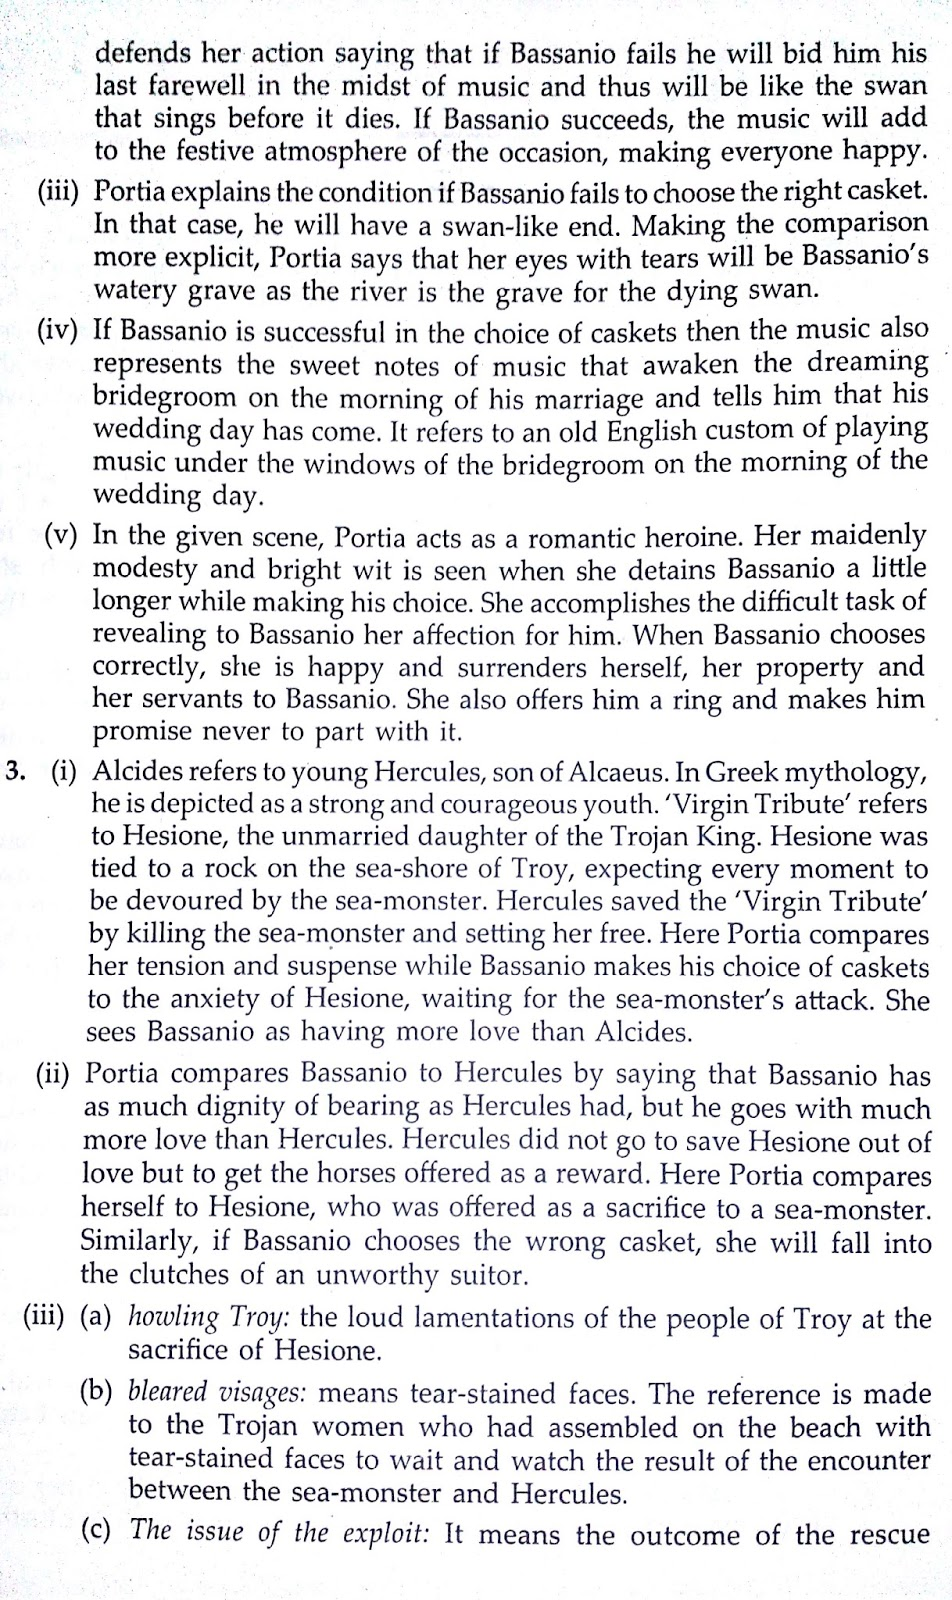 Act 3 Scene 2 Workbook The Merchant Of Venice Free 4 Analysis